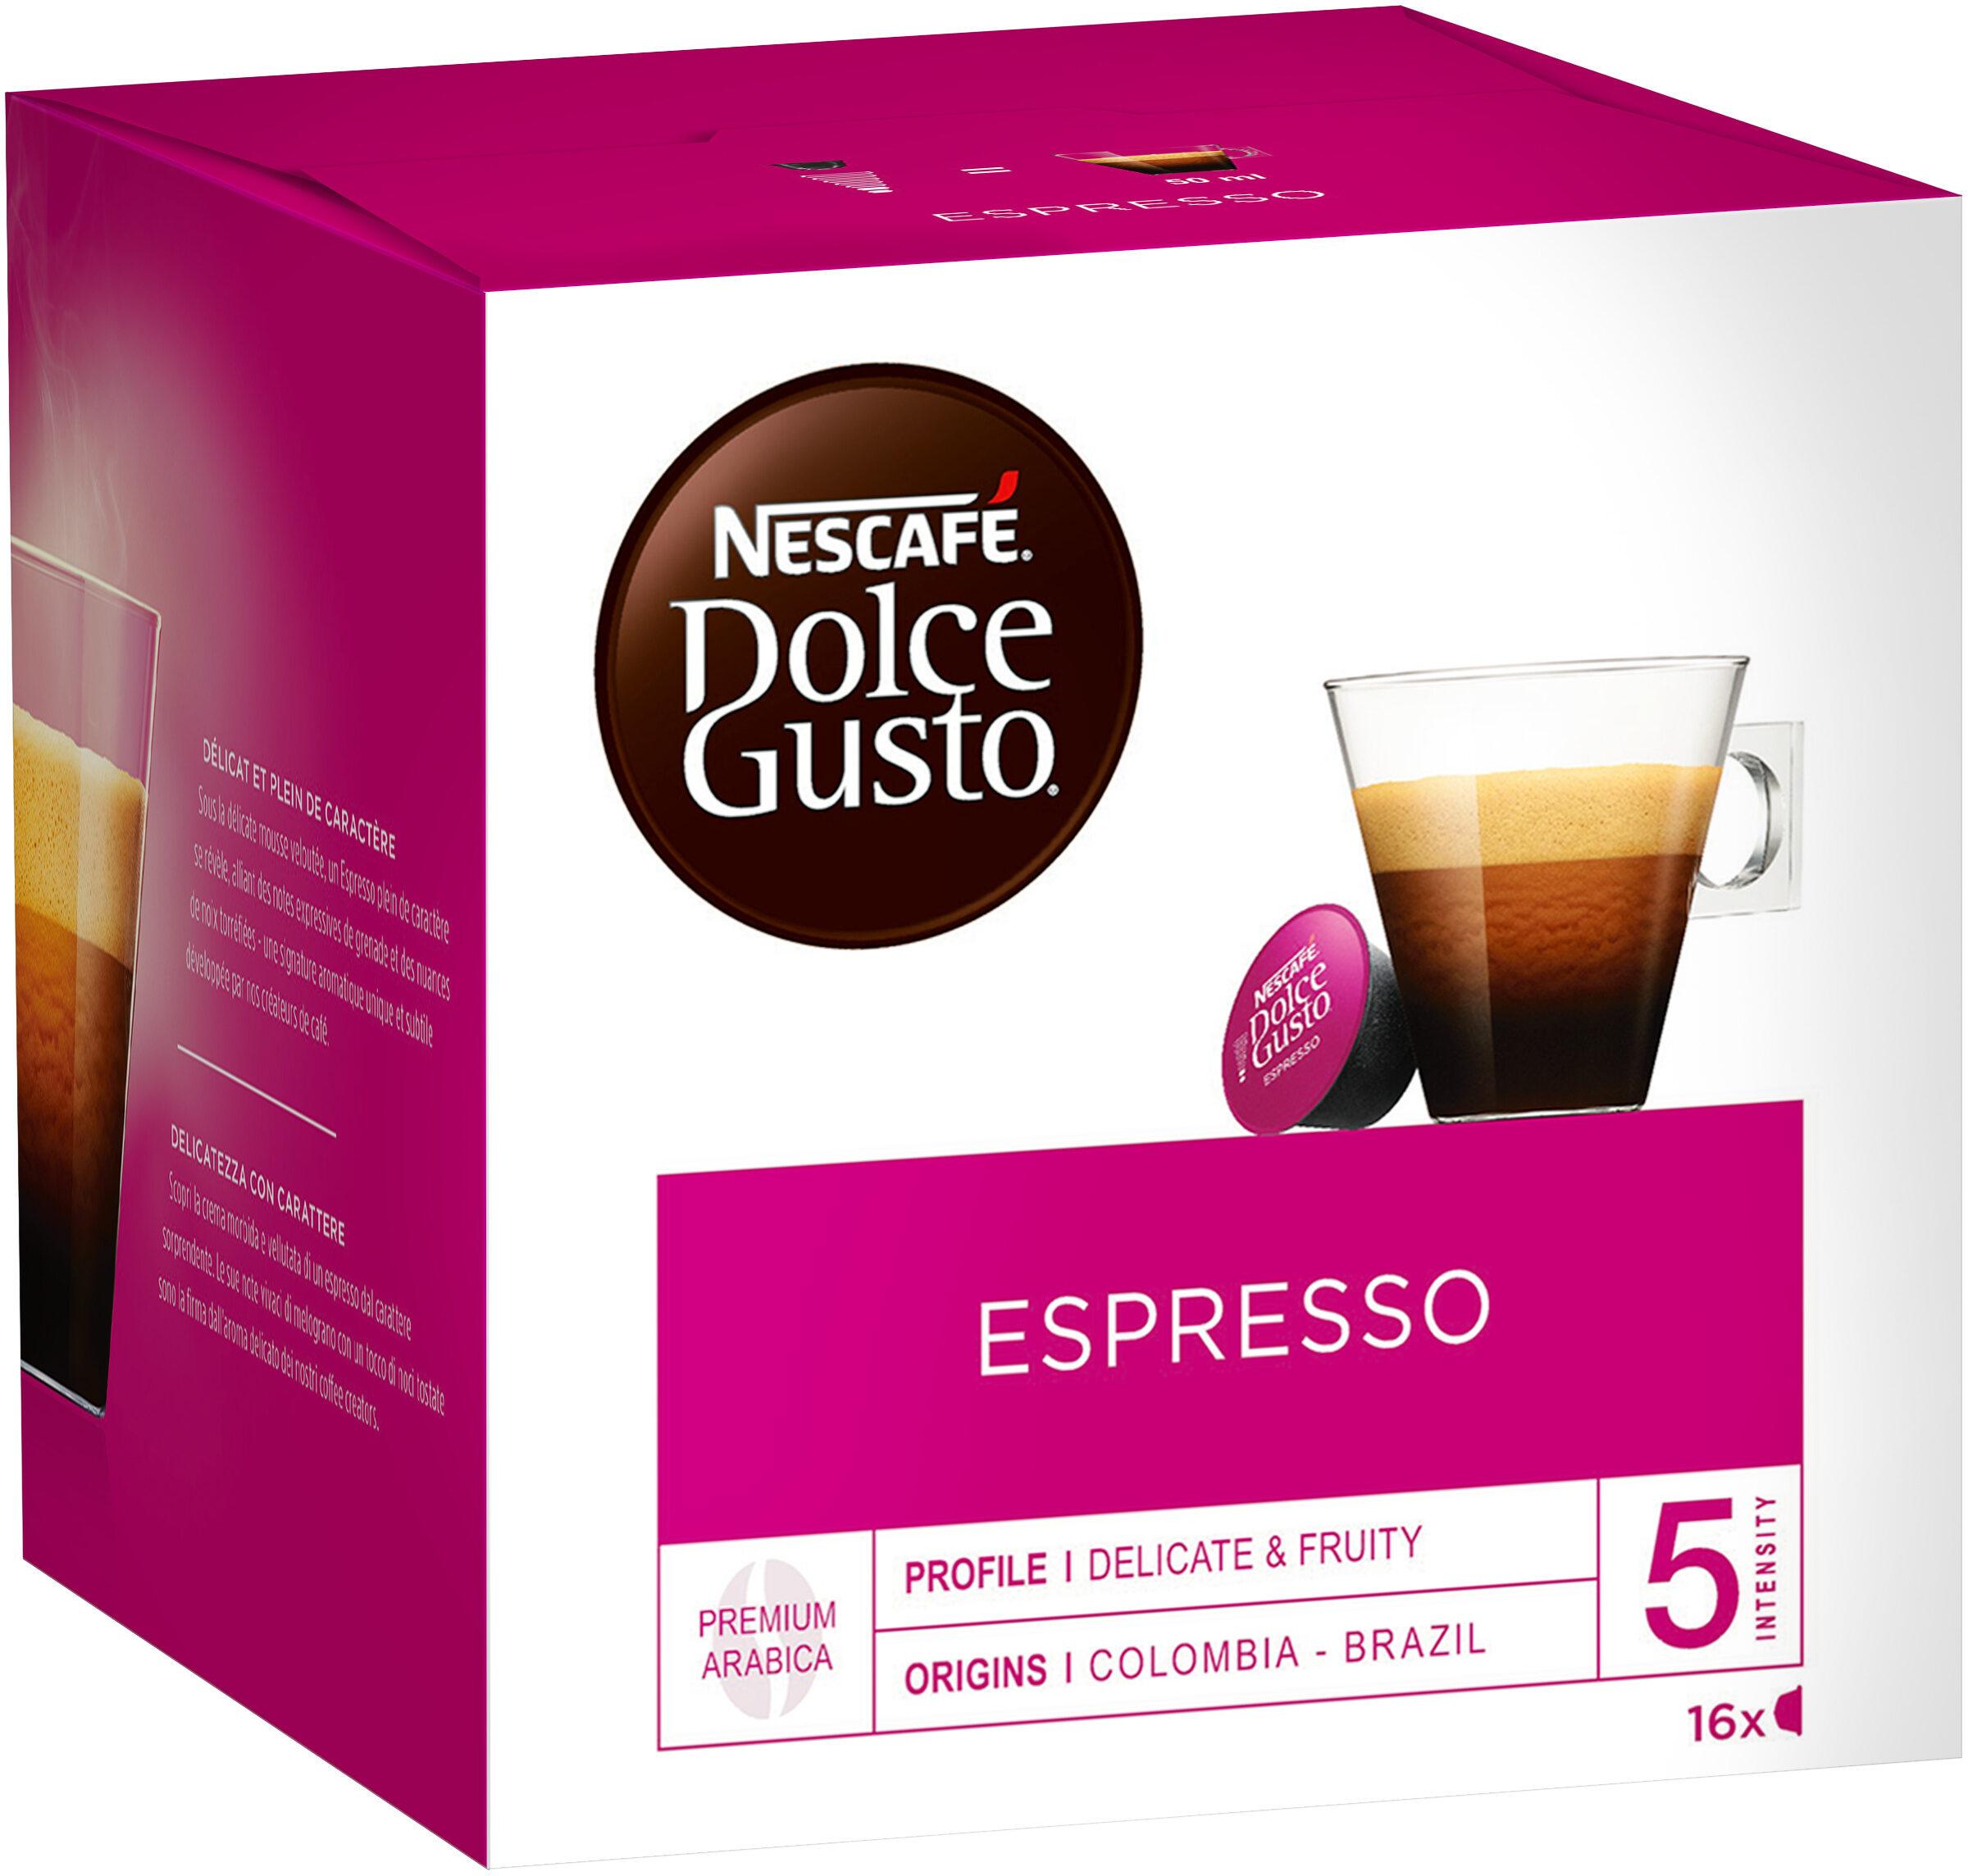 Capsules NESCAFE DOLCE GUSTO Espresso 16 Capsules - Produit - fr